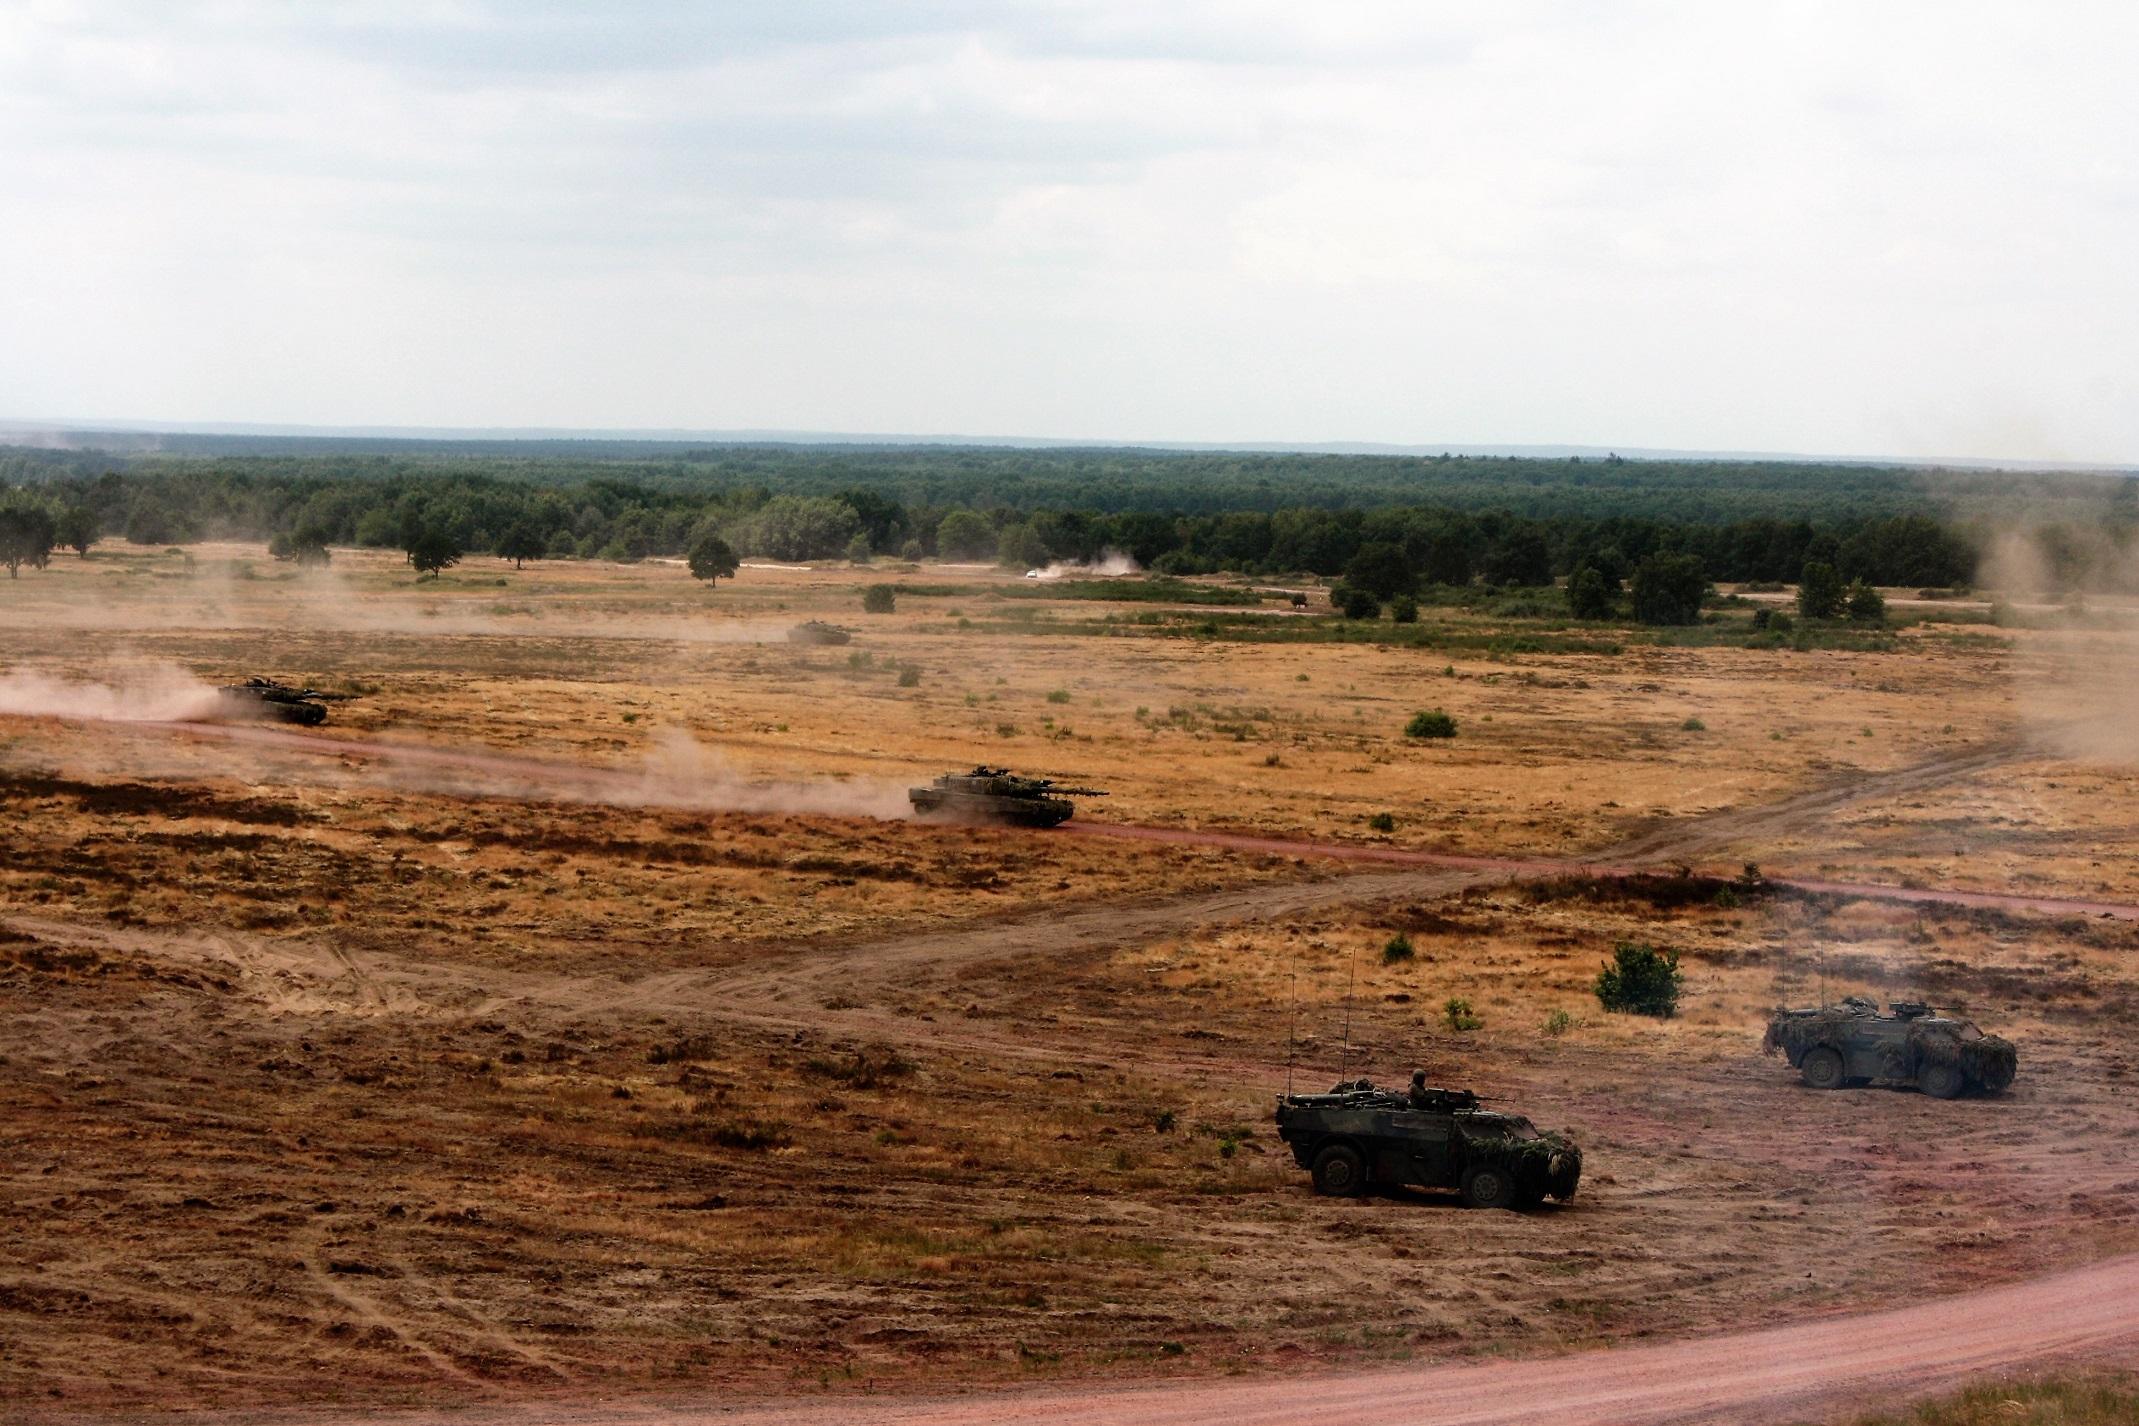 German Leopard 2 tanks simulatiing a fast attack on Schnöggersburg - foto: Björn Müller (all rights reserved)